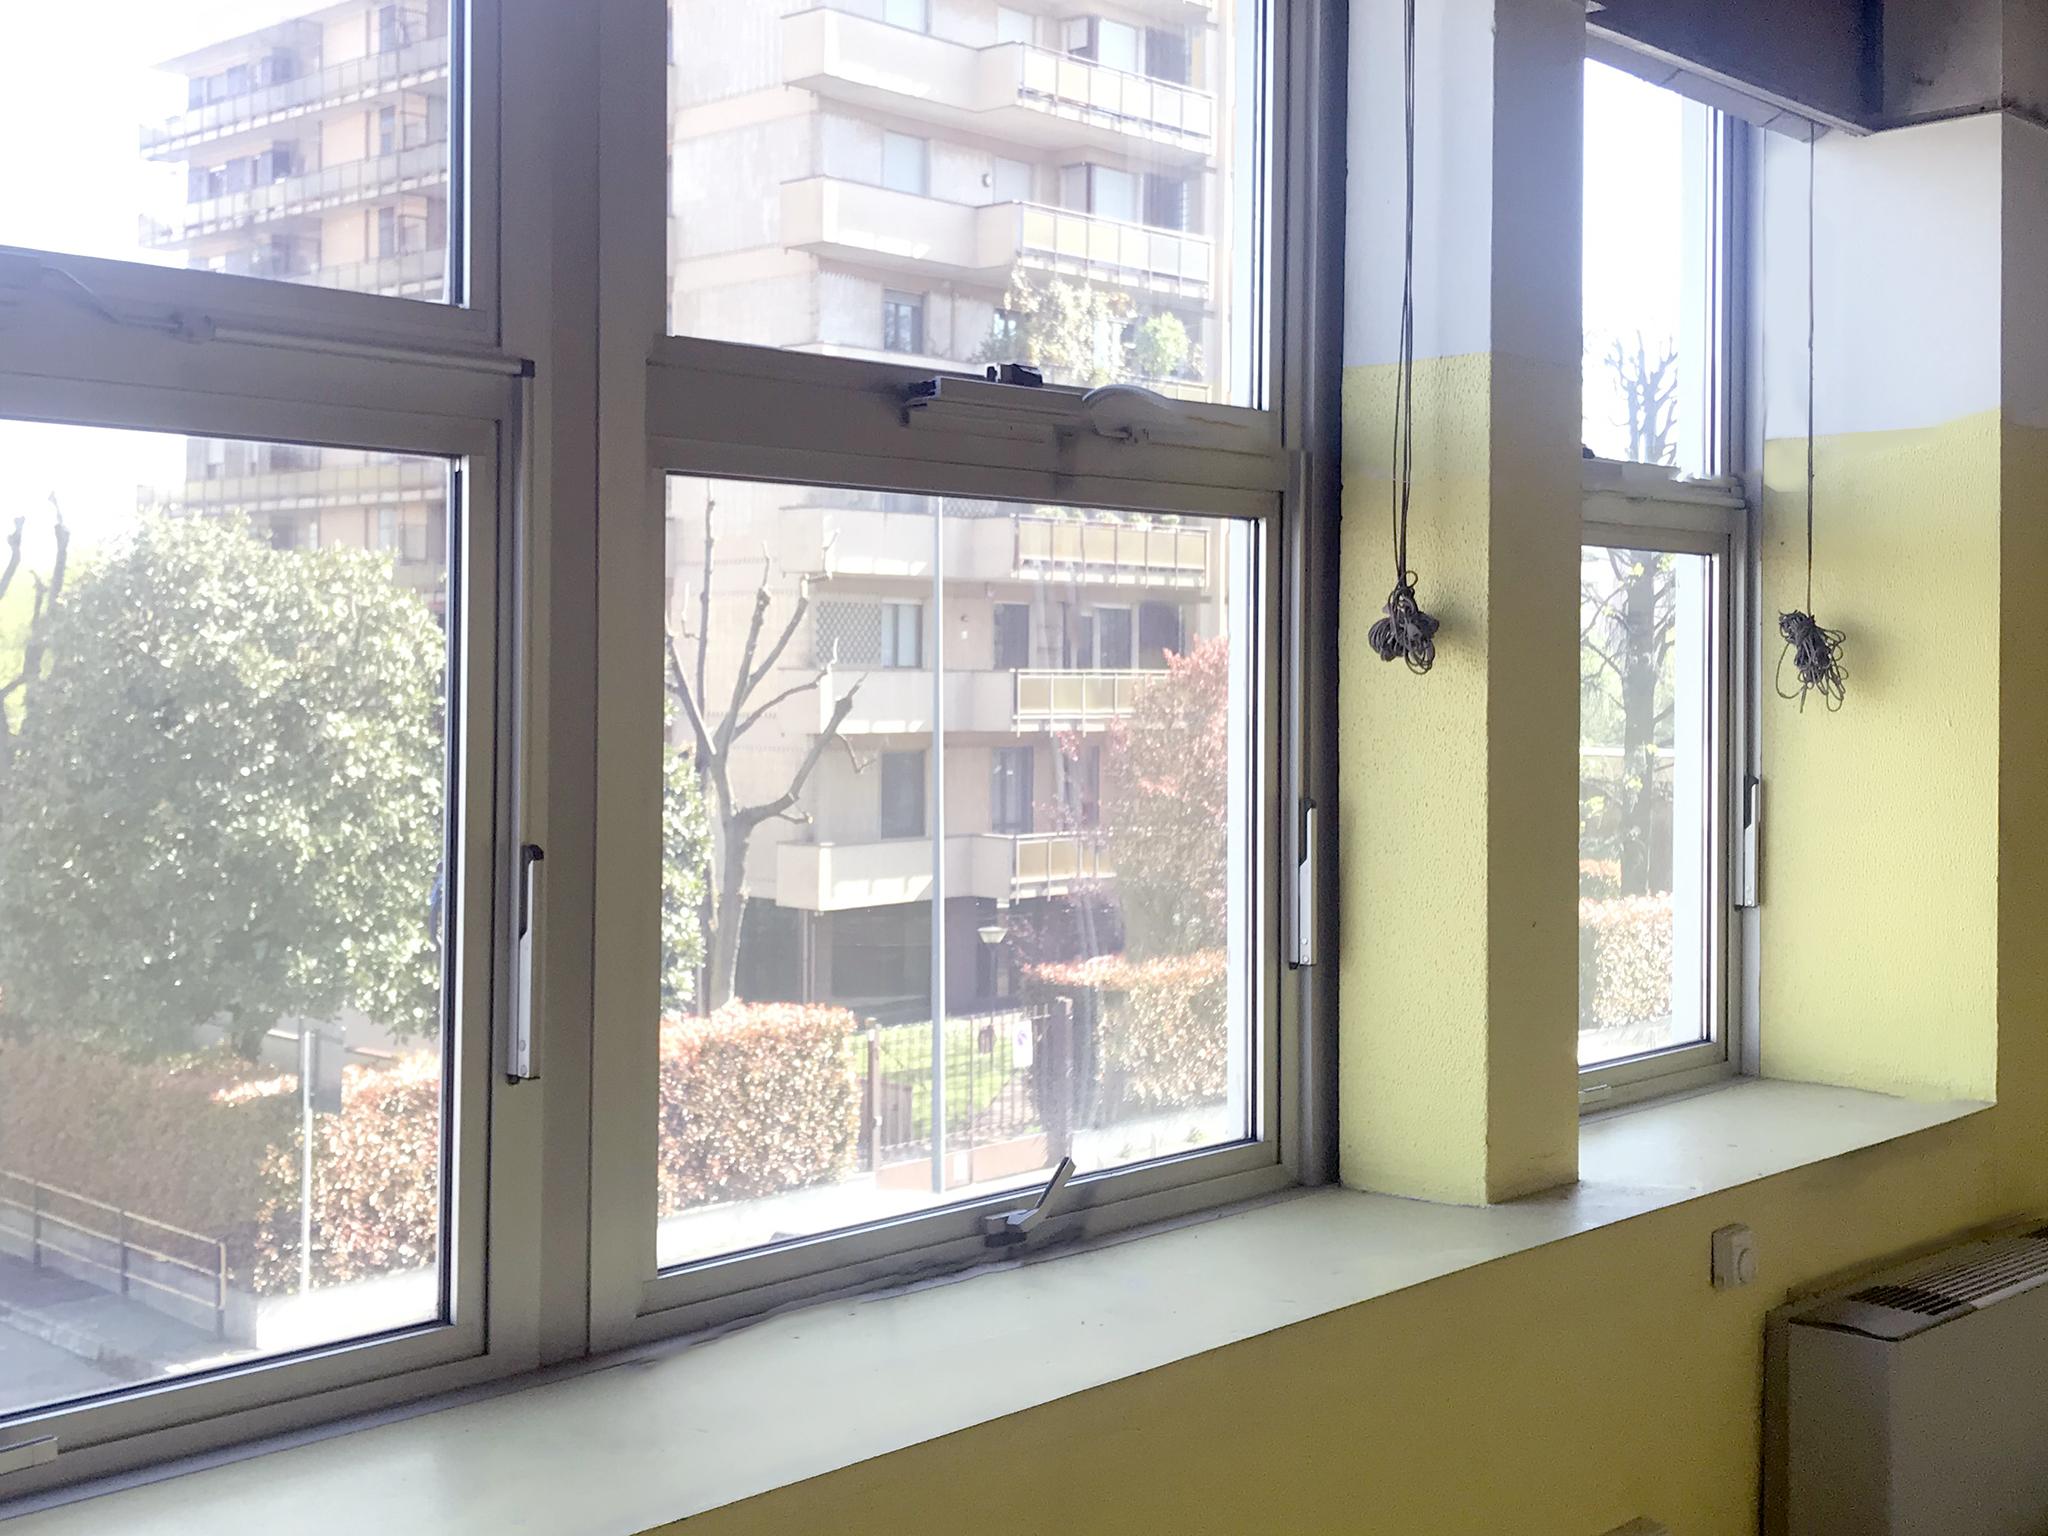 Office windows on Via Fantoli